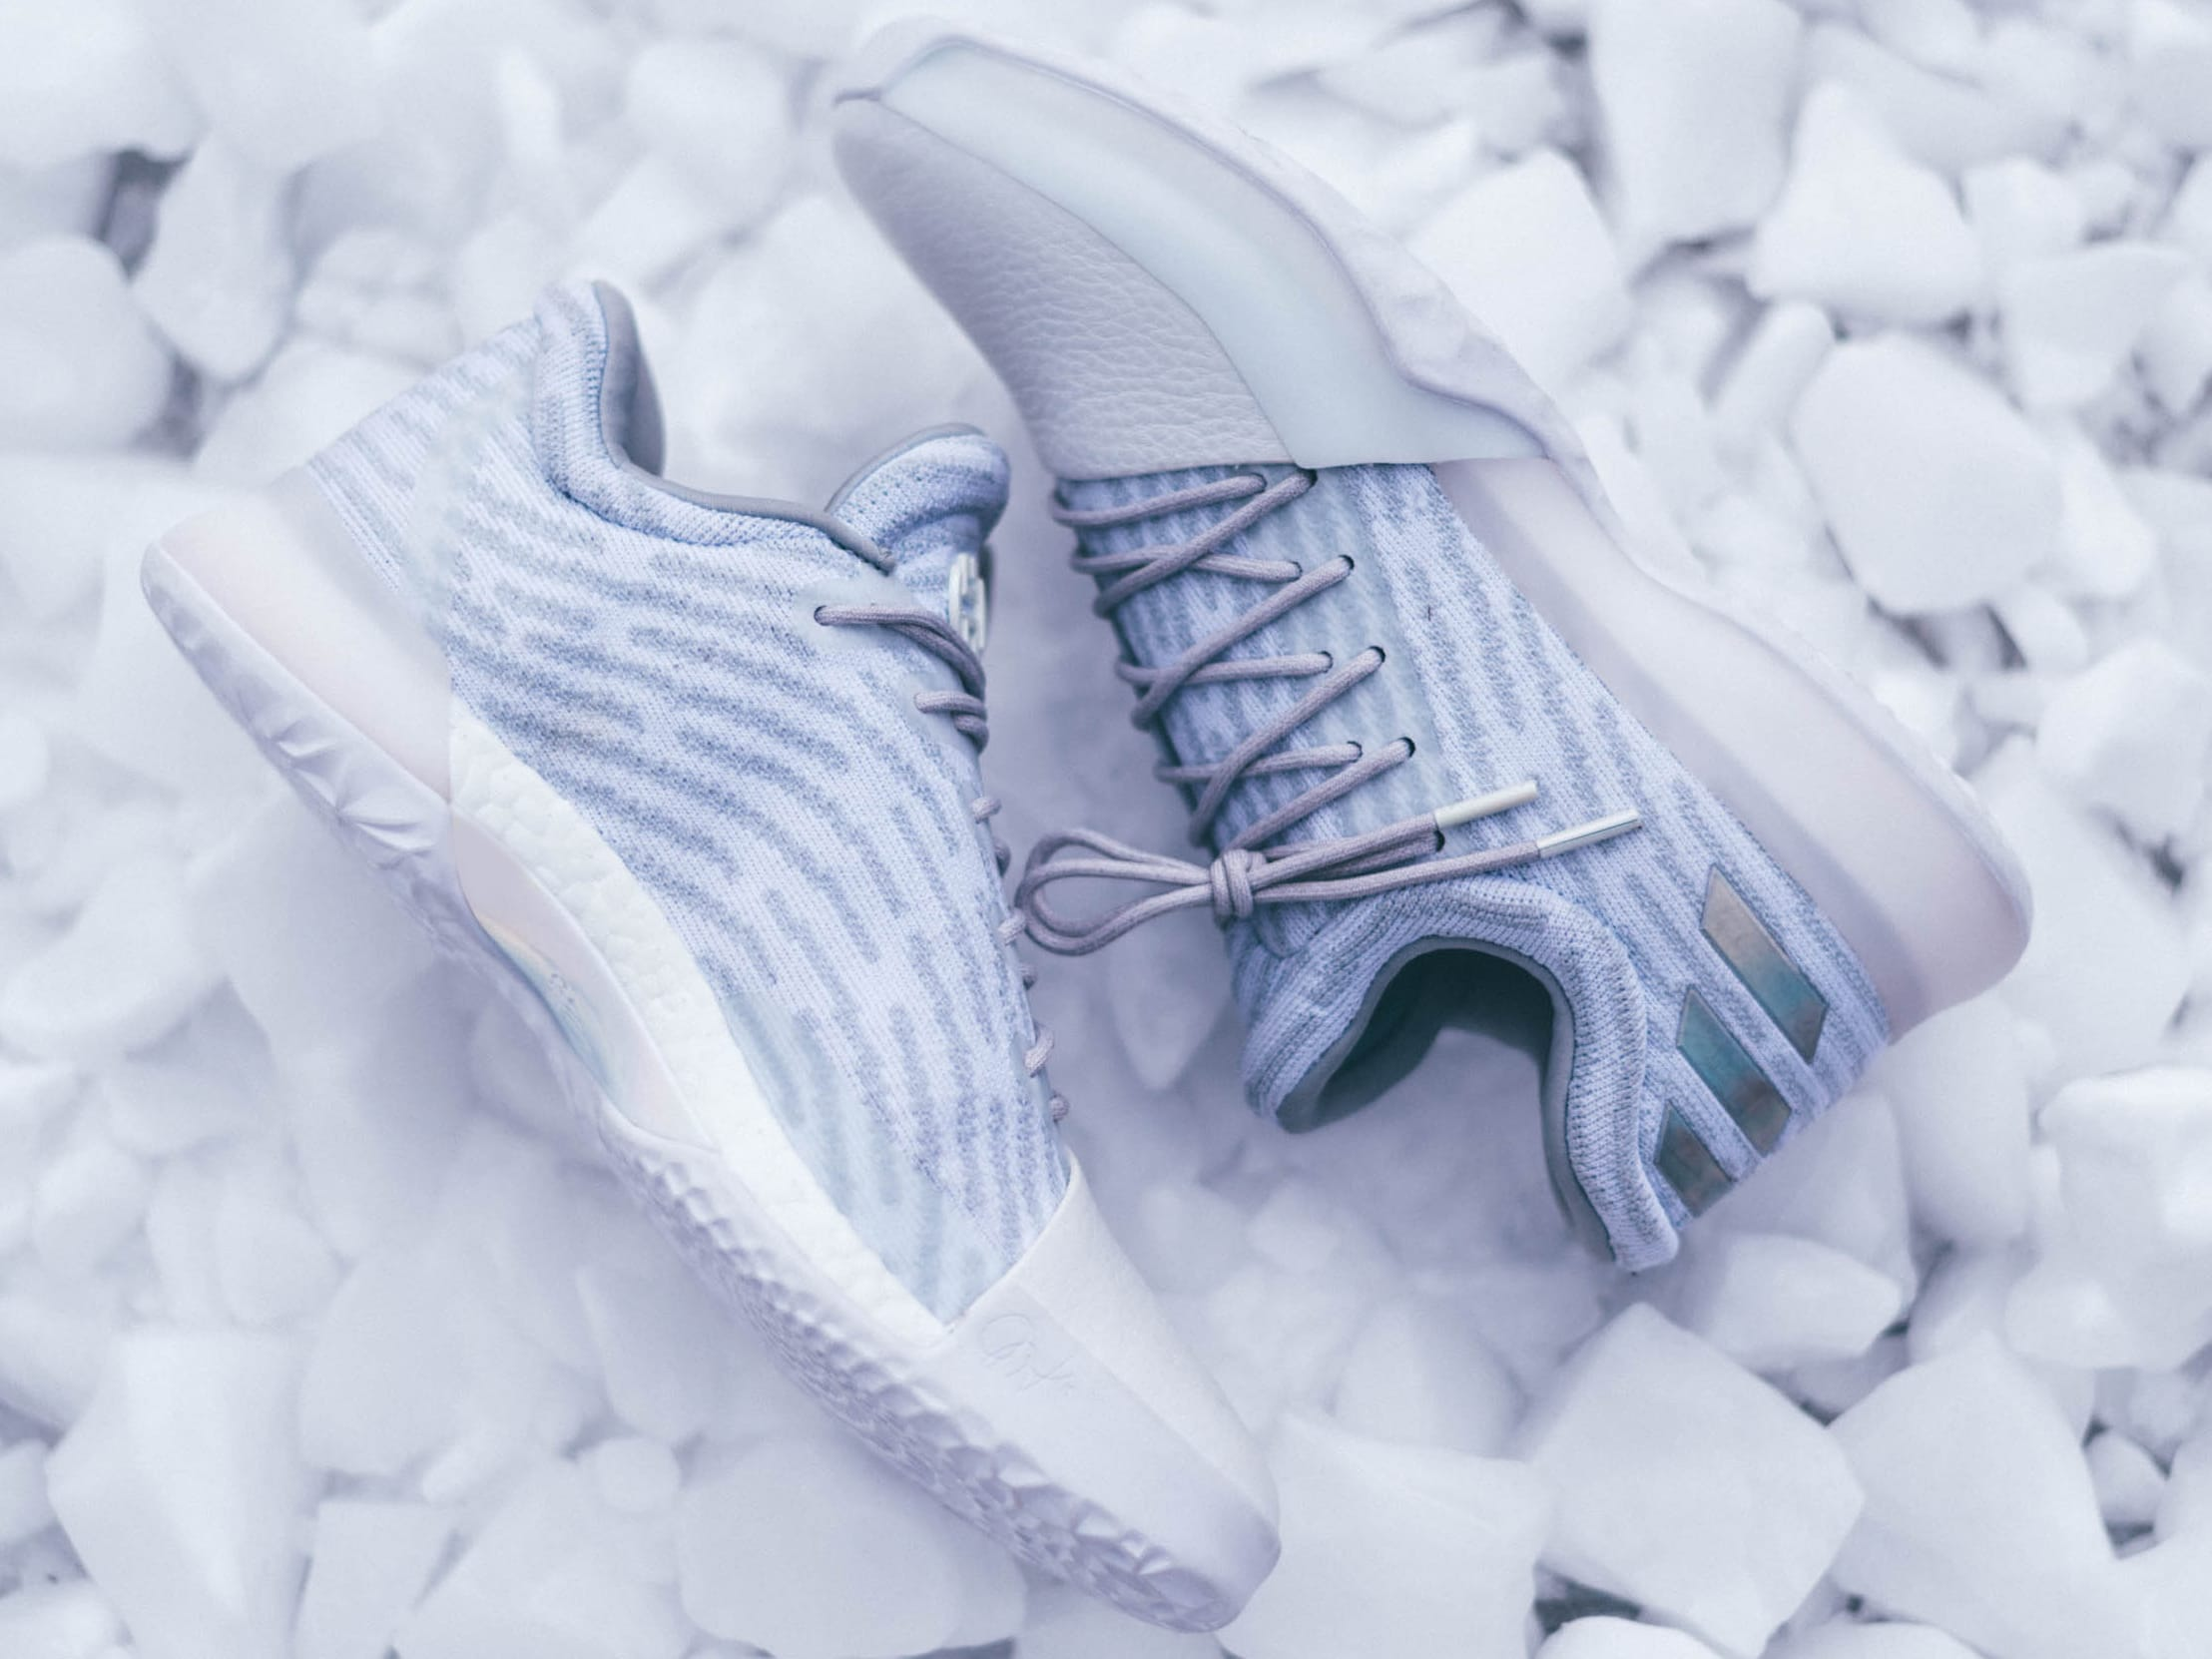 Adidas Harden Vol. 1 13 Below Zero